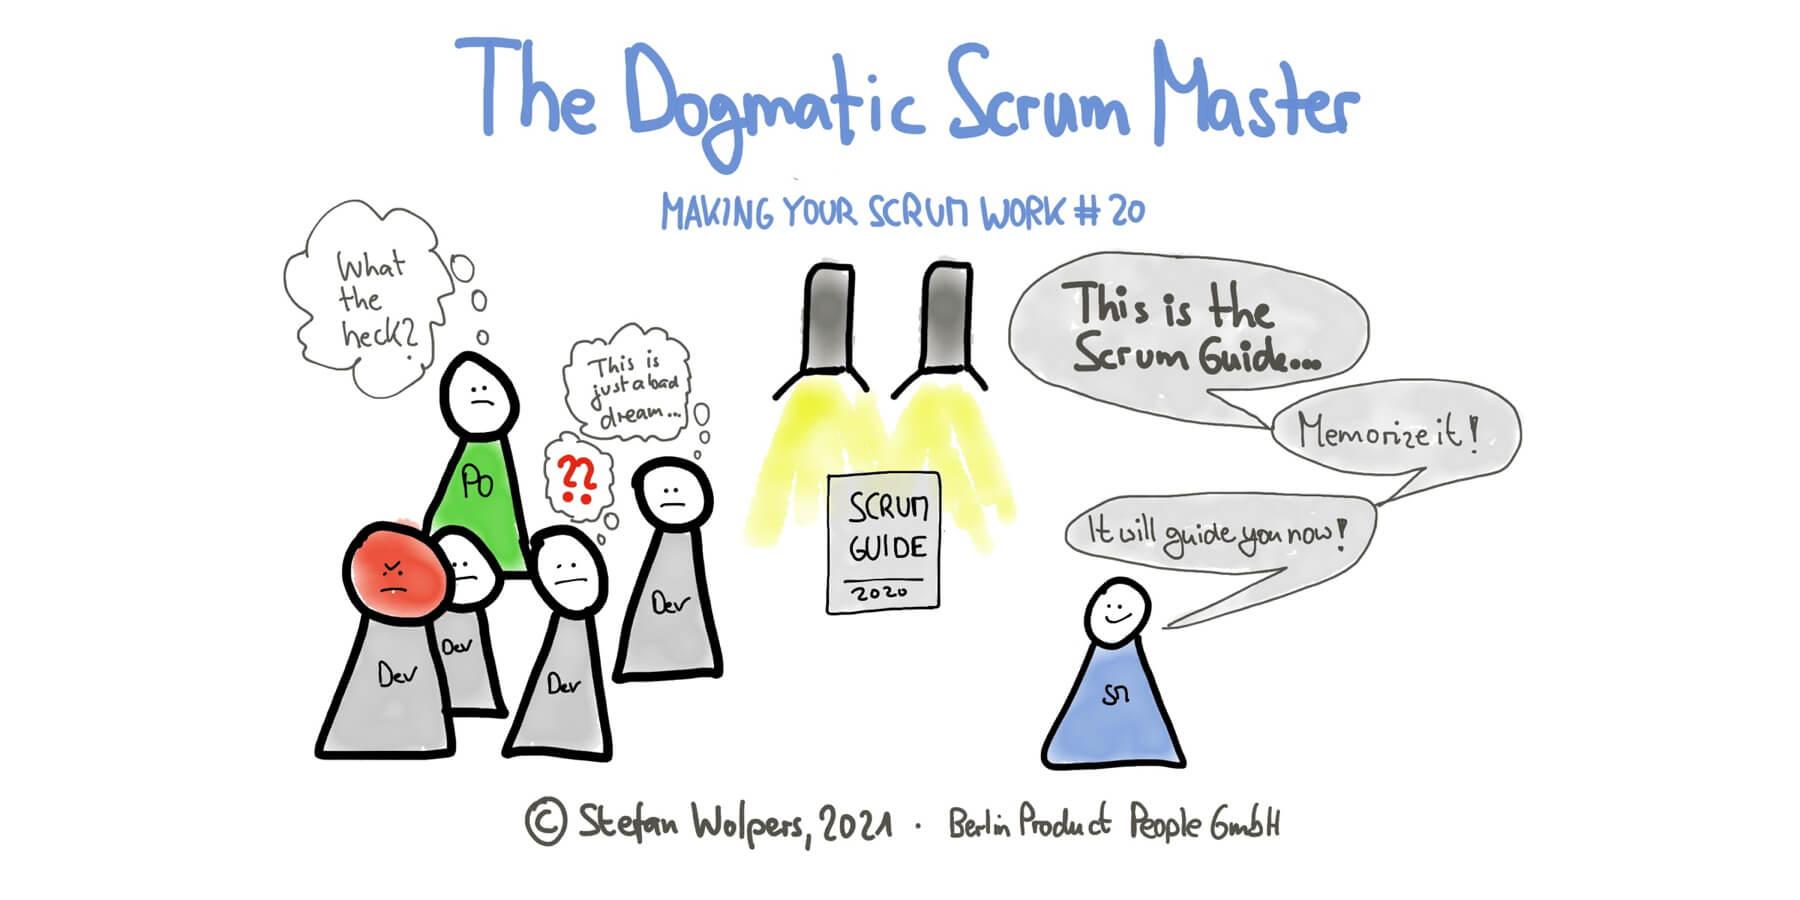 The Dogmatic Scrum Master Anti-Pattern — Making Your Scrum Work #20